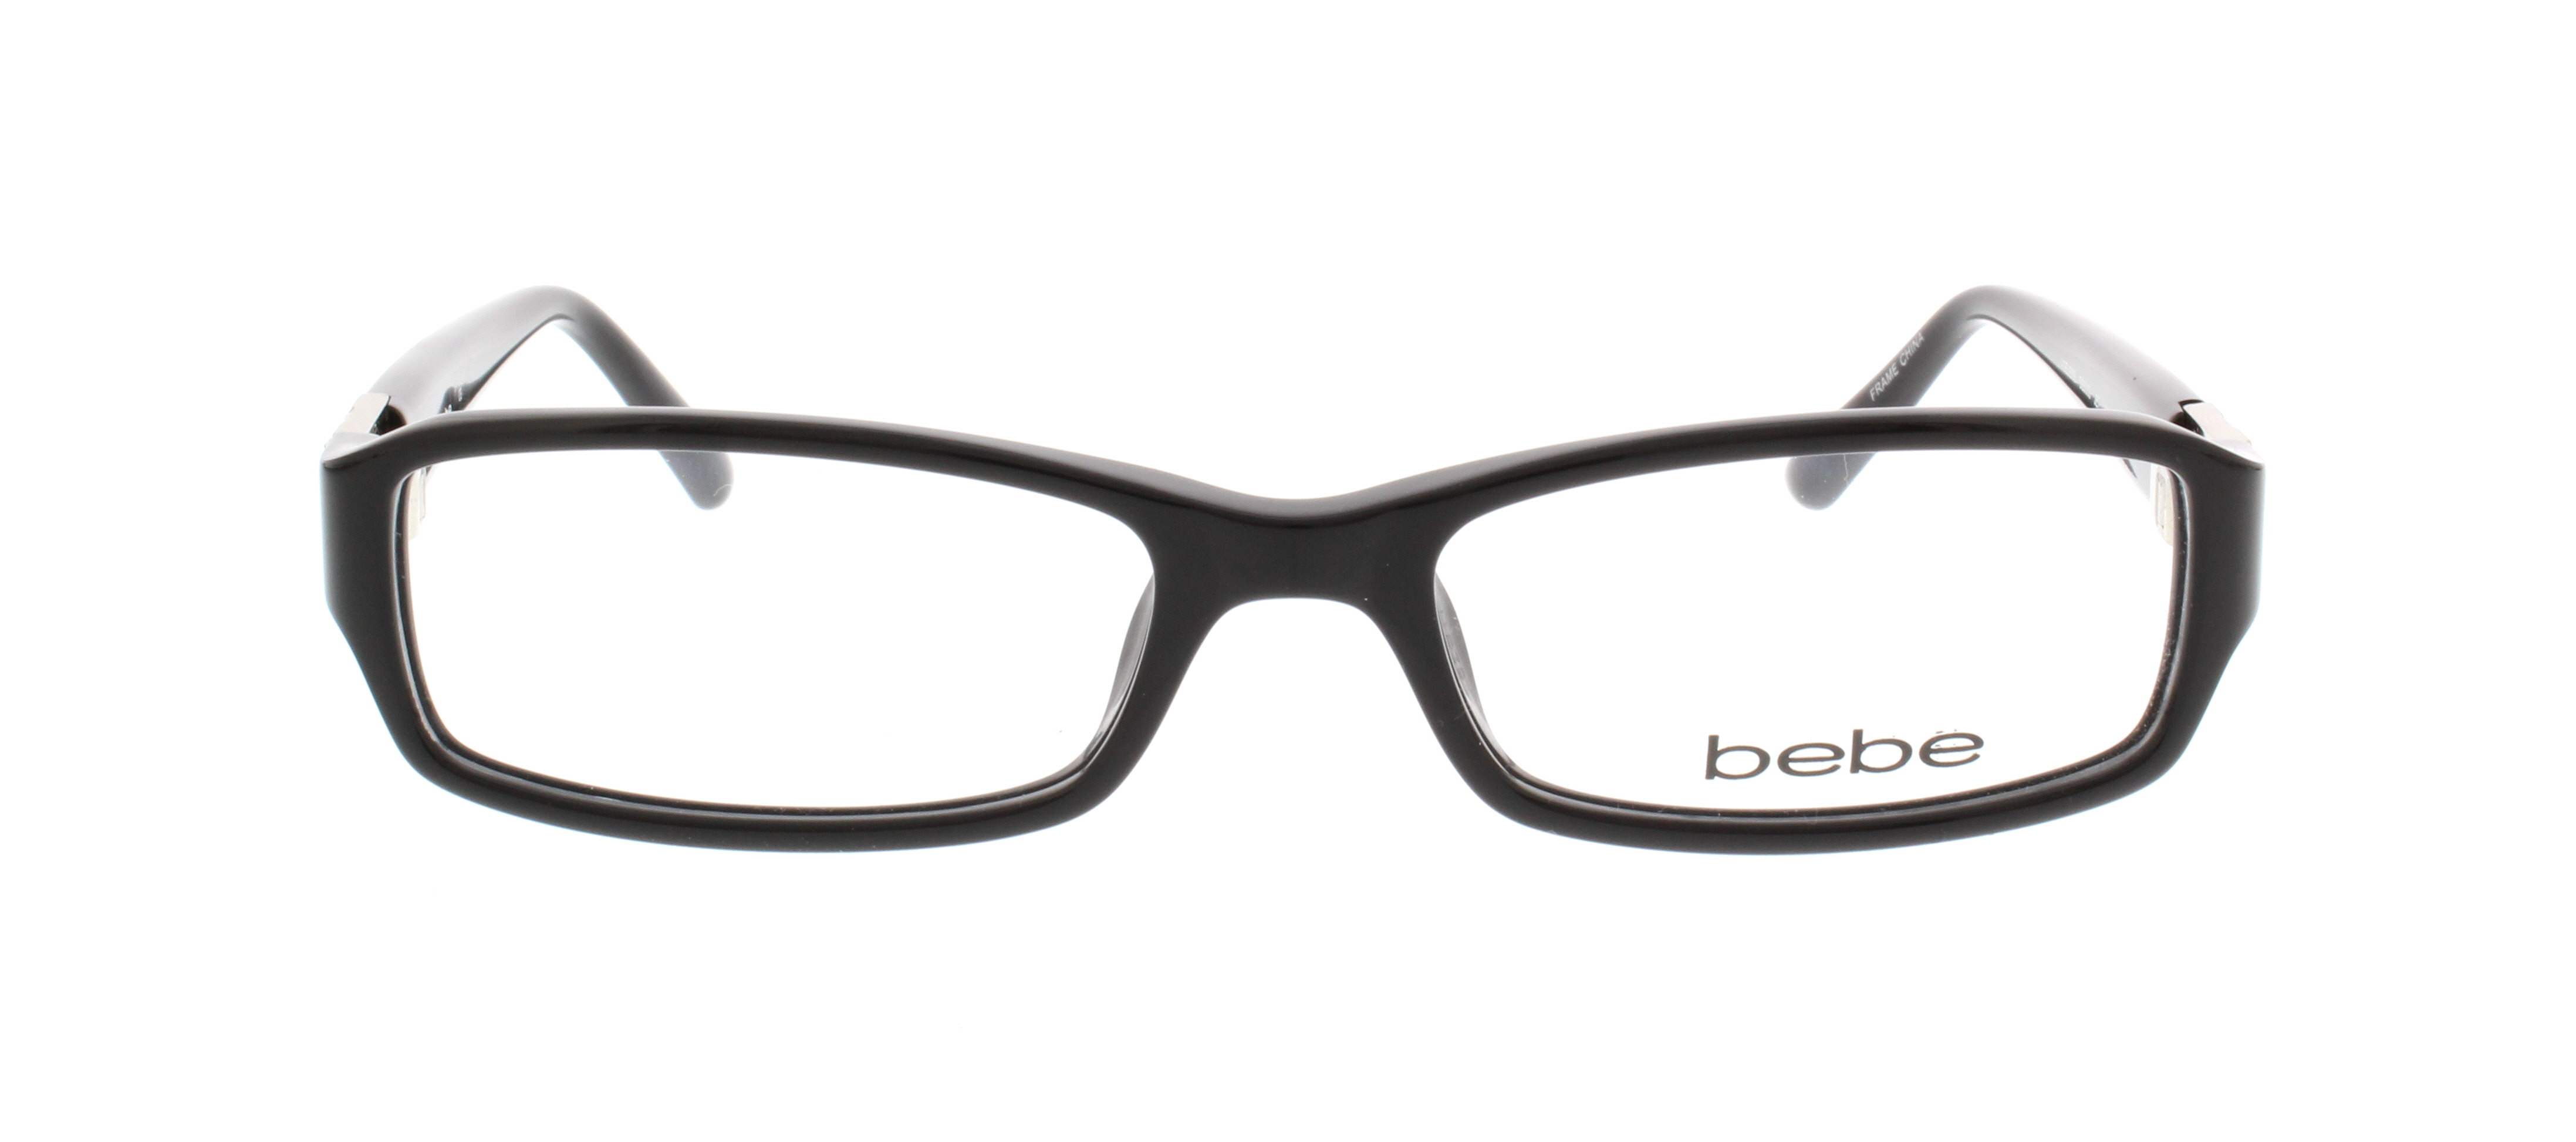 BEBE Eyeglasses BB5008 001 Jet 52MM - Walmart.com